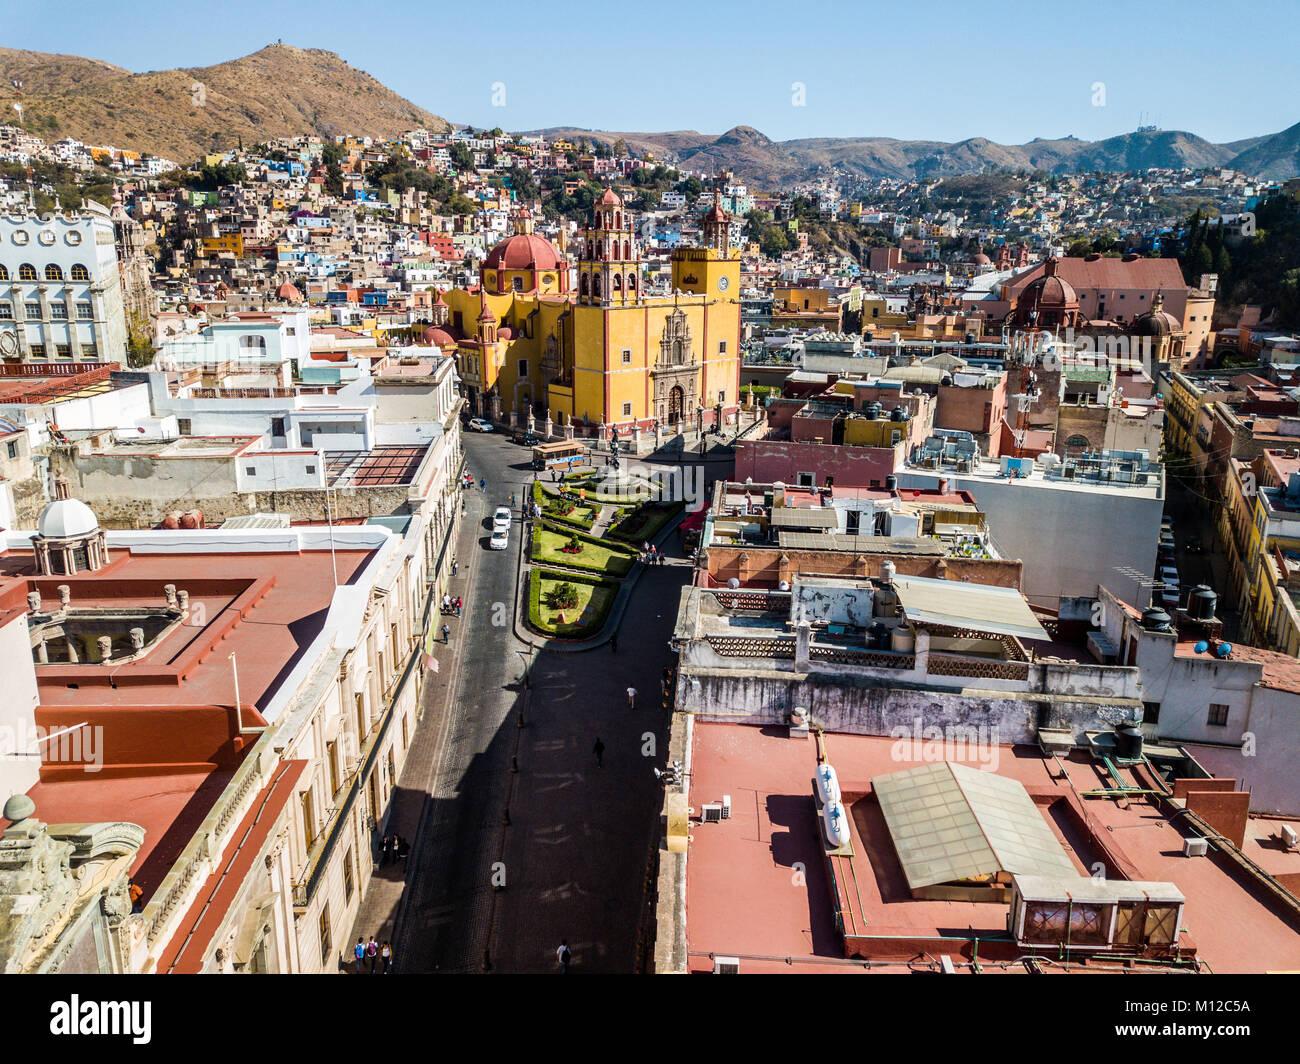 Basilica Colegiata de Nuestra Senora de Guanajuato, or Basilica of Our Lady of Guanajuato, Mexico - Stock Image